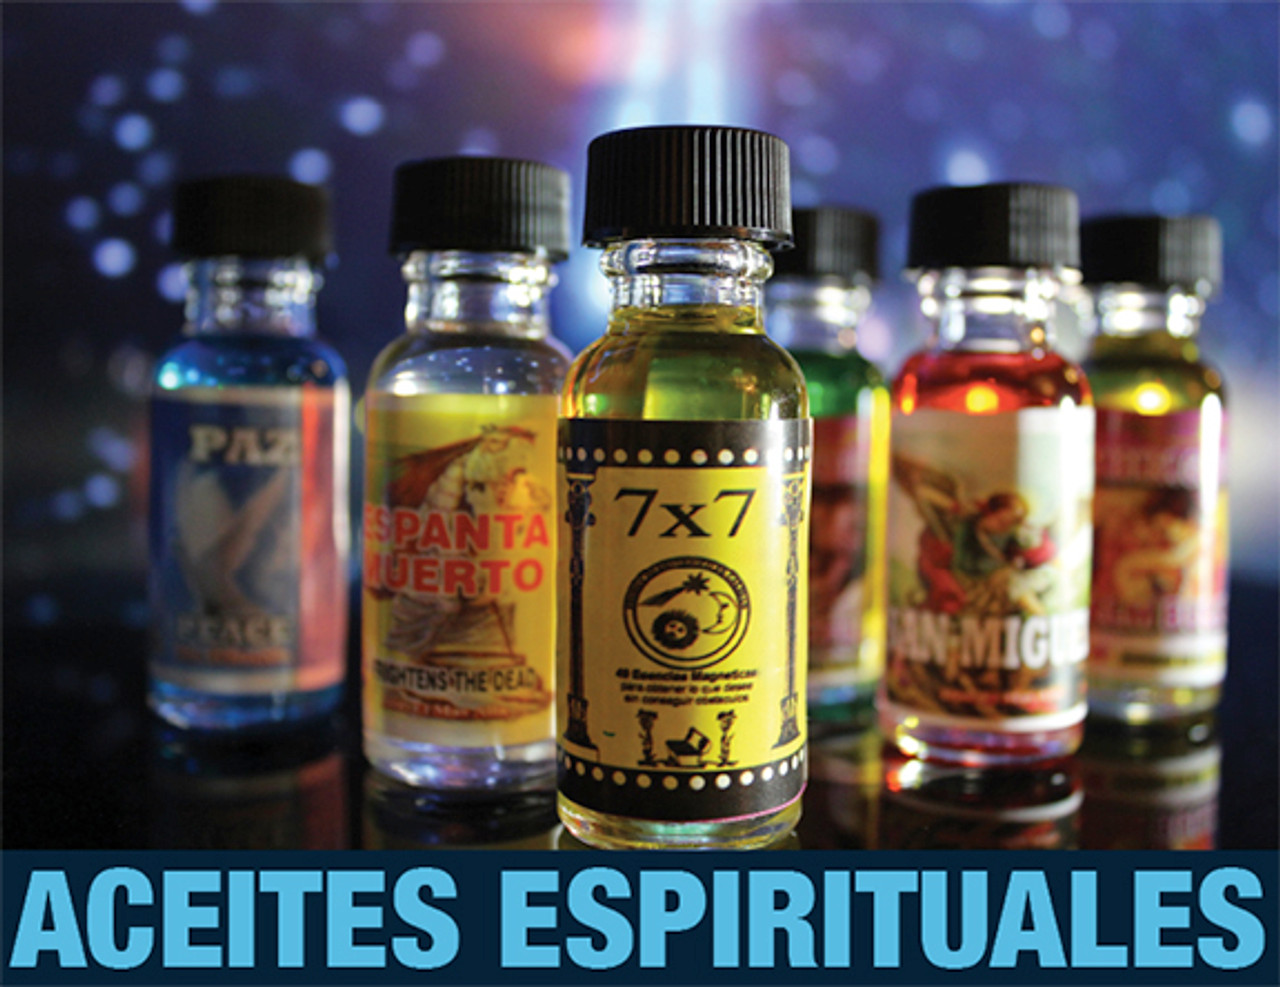 A-Z Aceite Espirituales 245 Variedades Disponibles